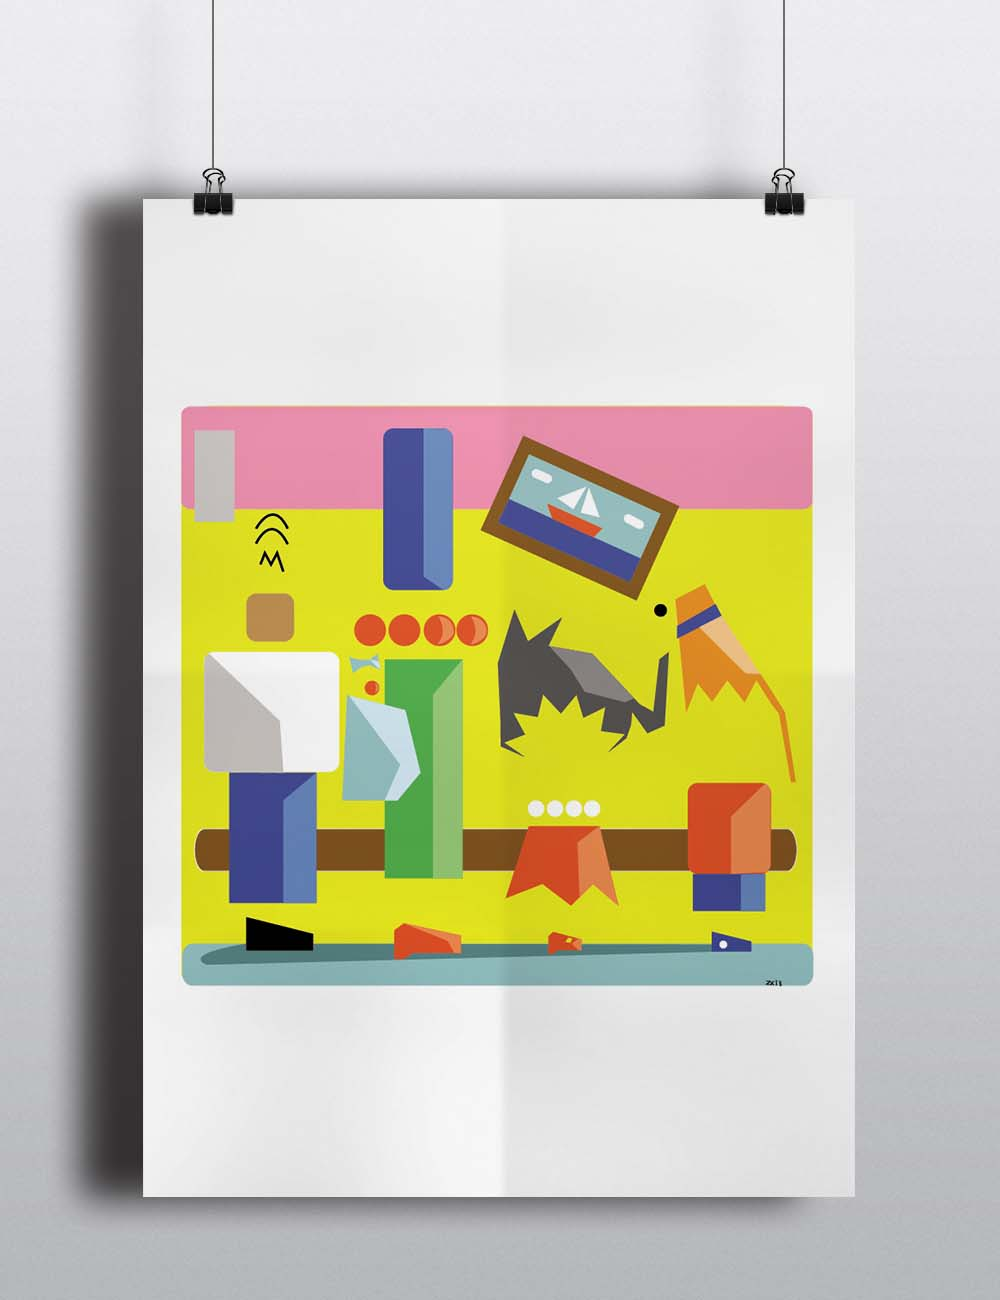 simpsons poster.jpg